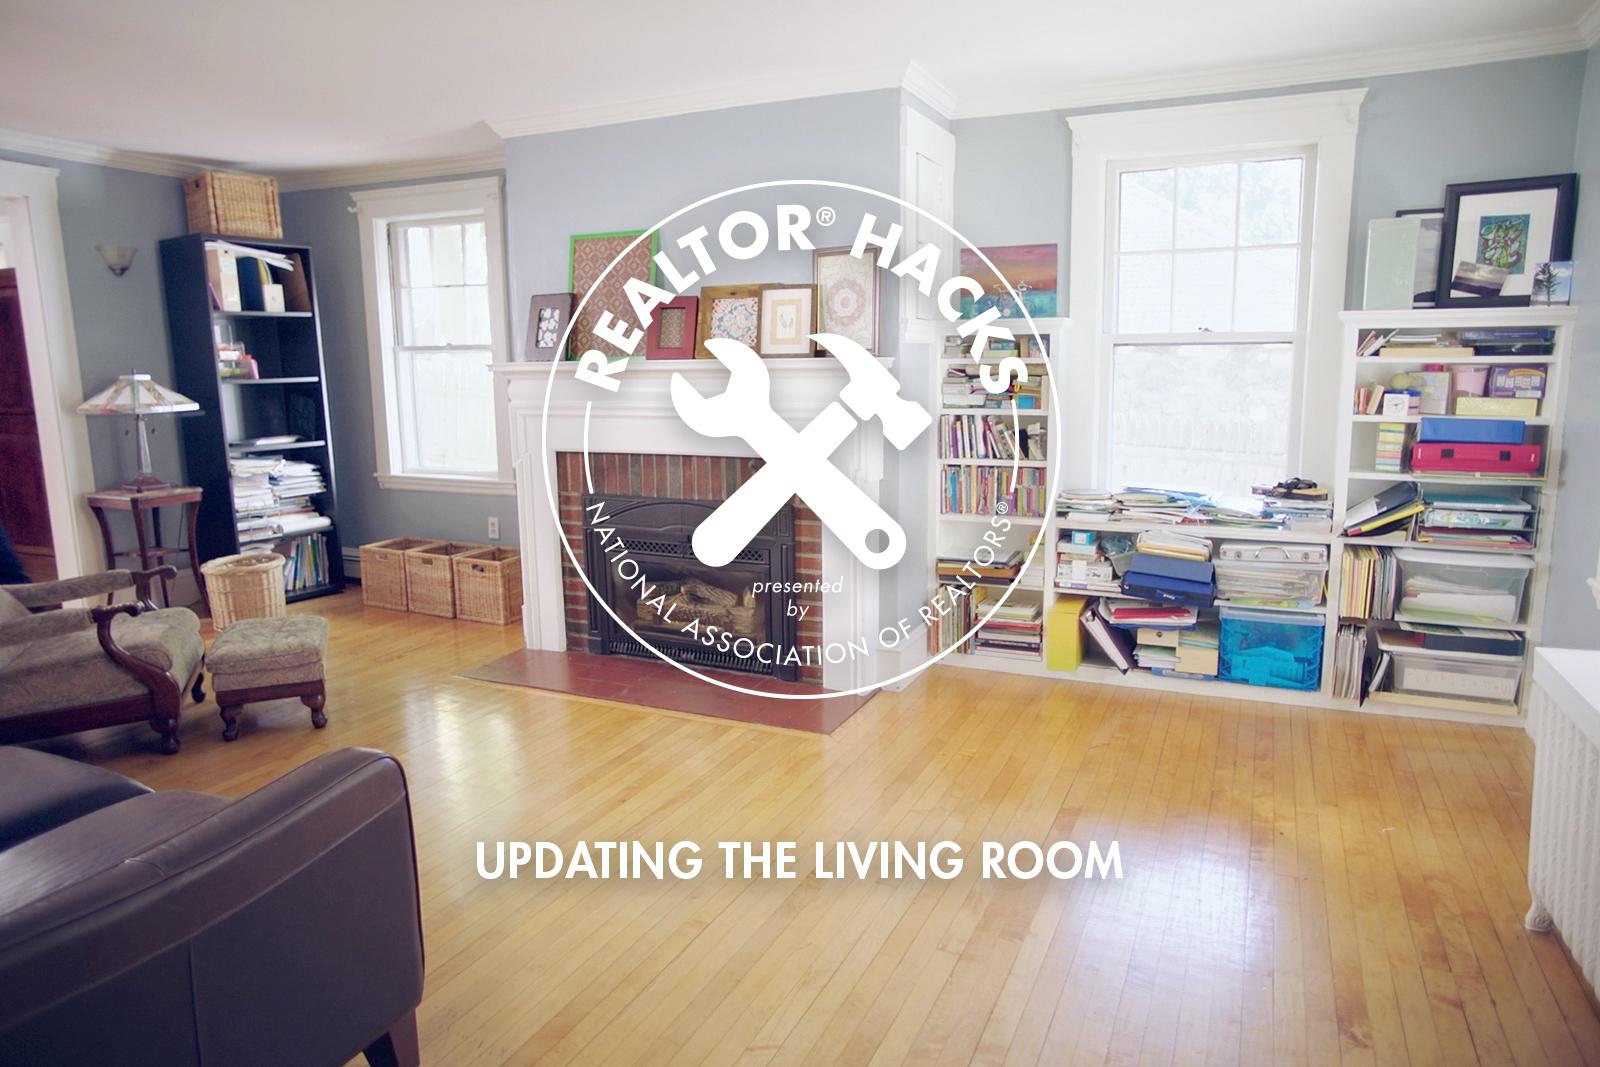 Realtor® Hacks: Updating the Living Room